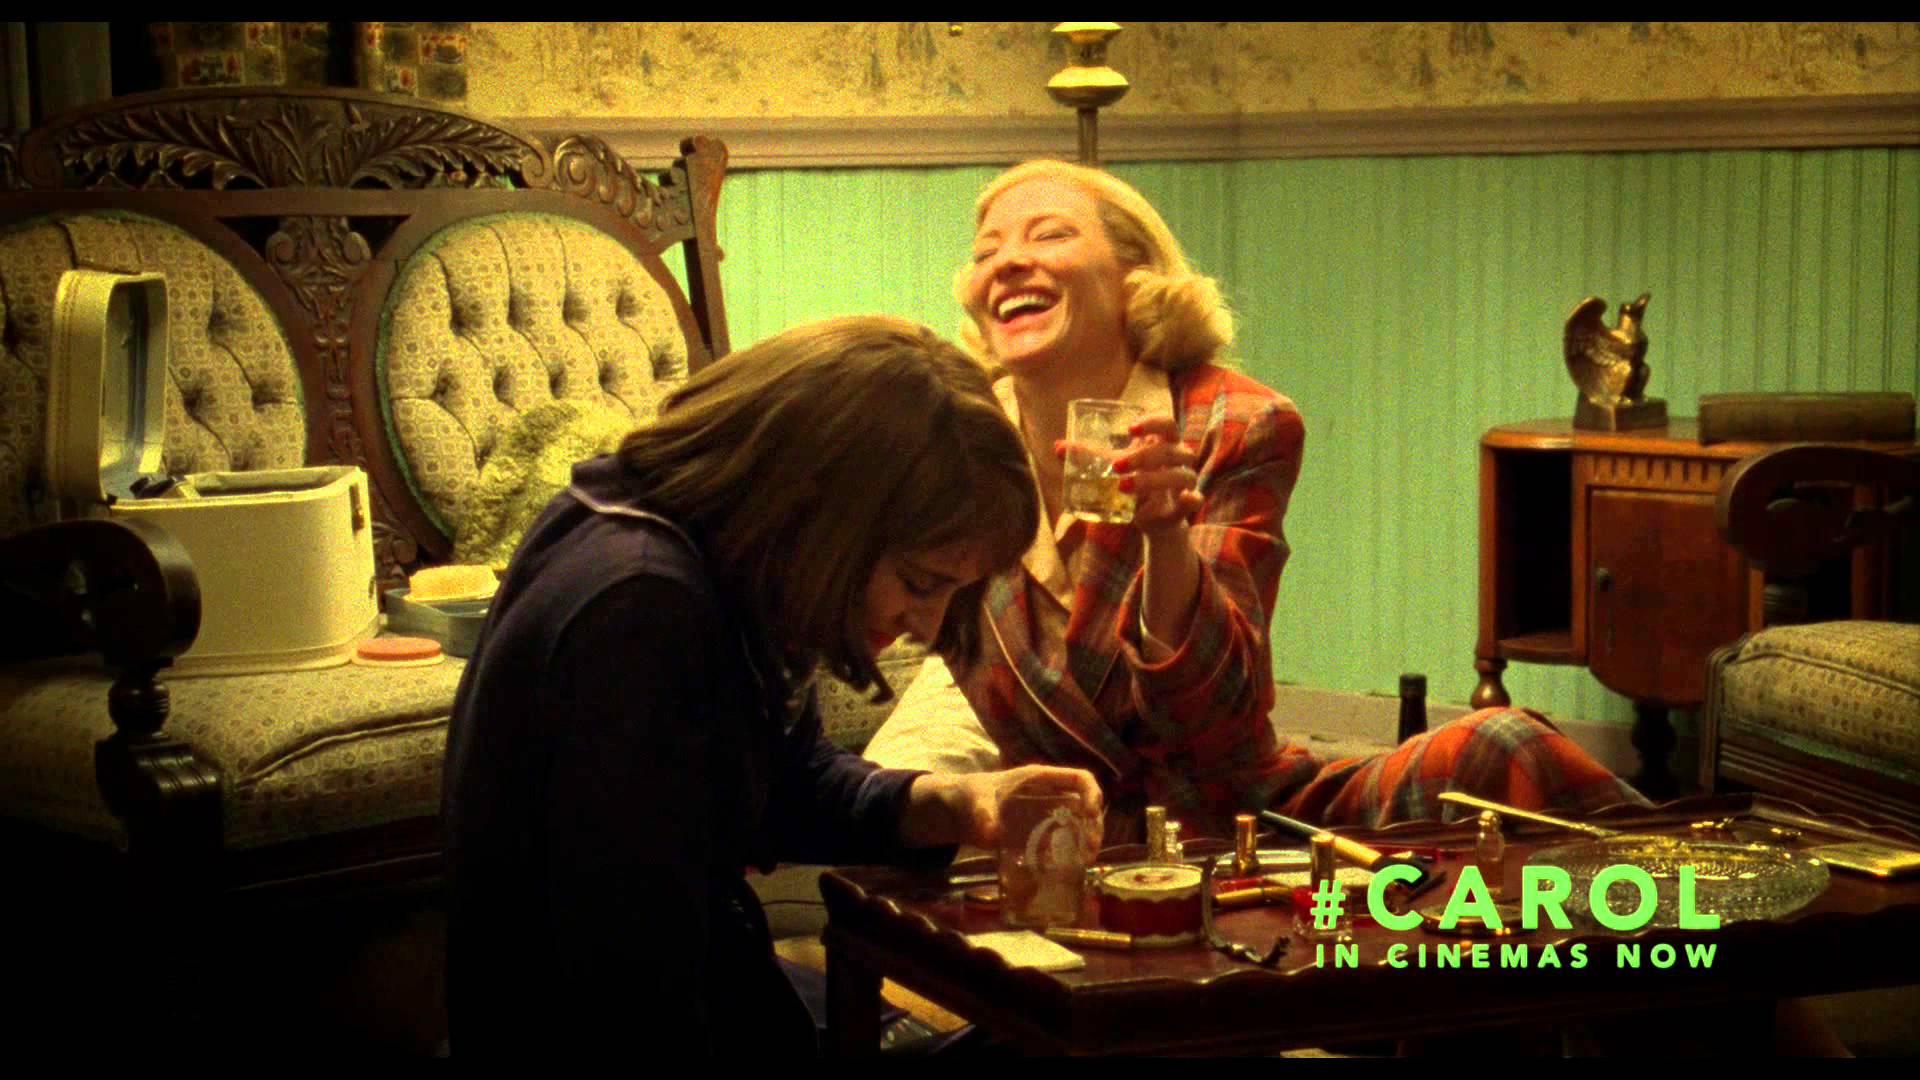 CAROL – In Cinemas Now